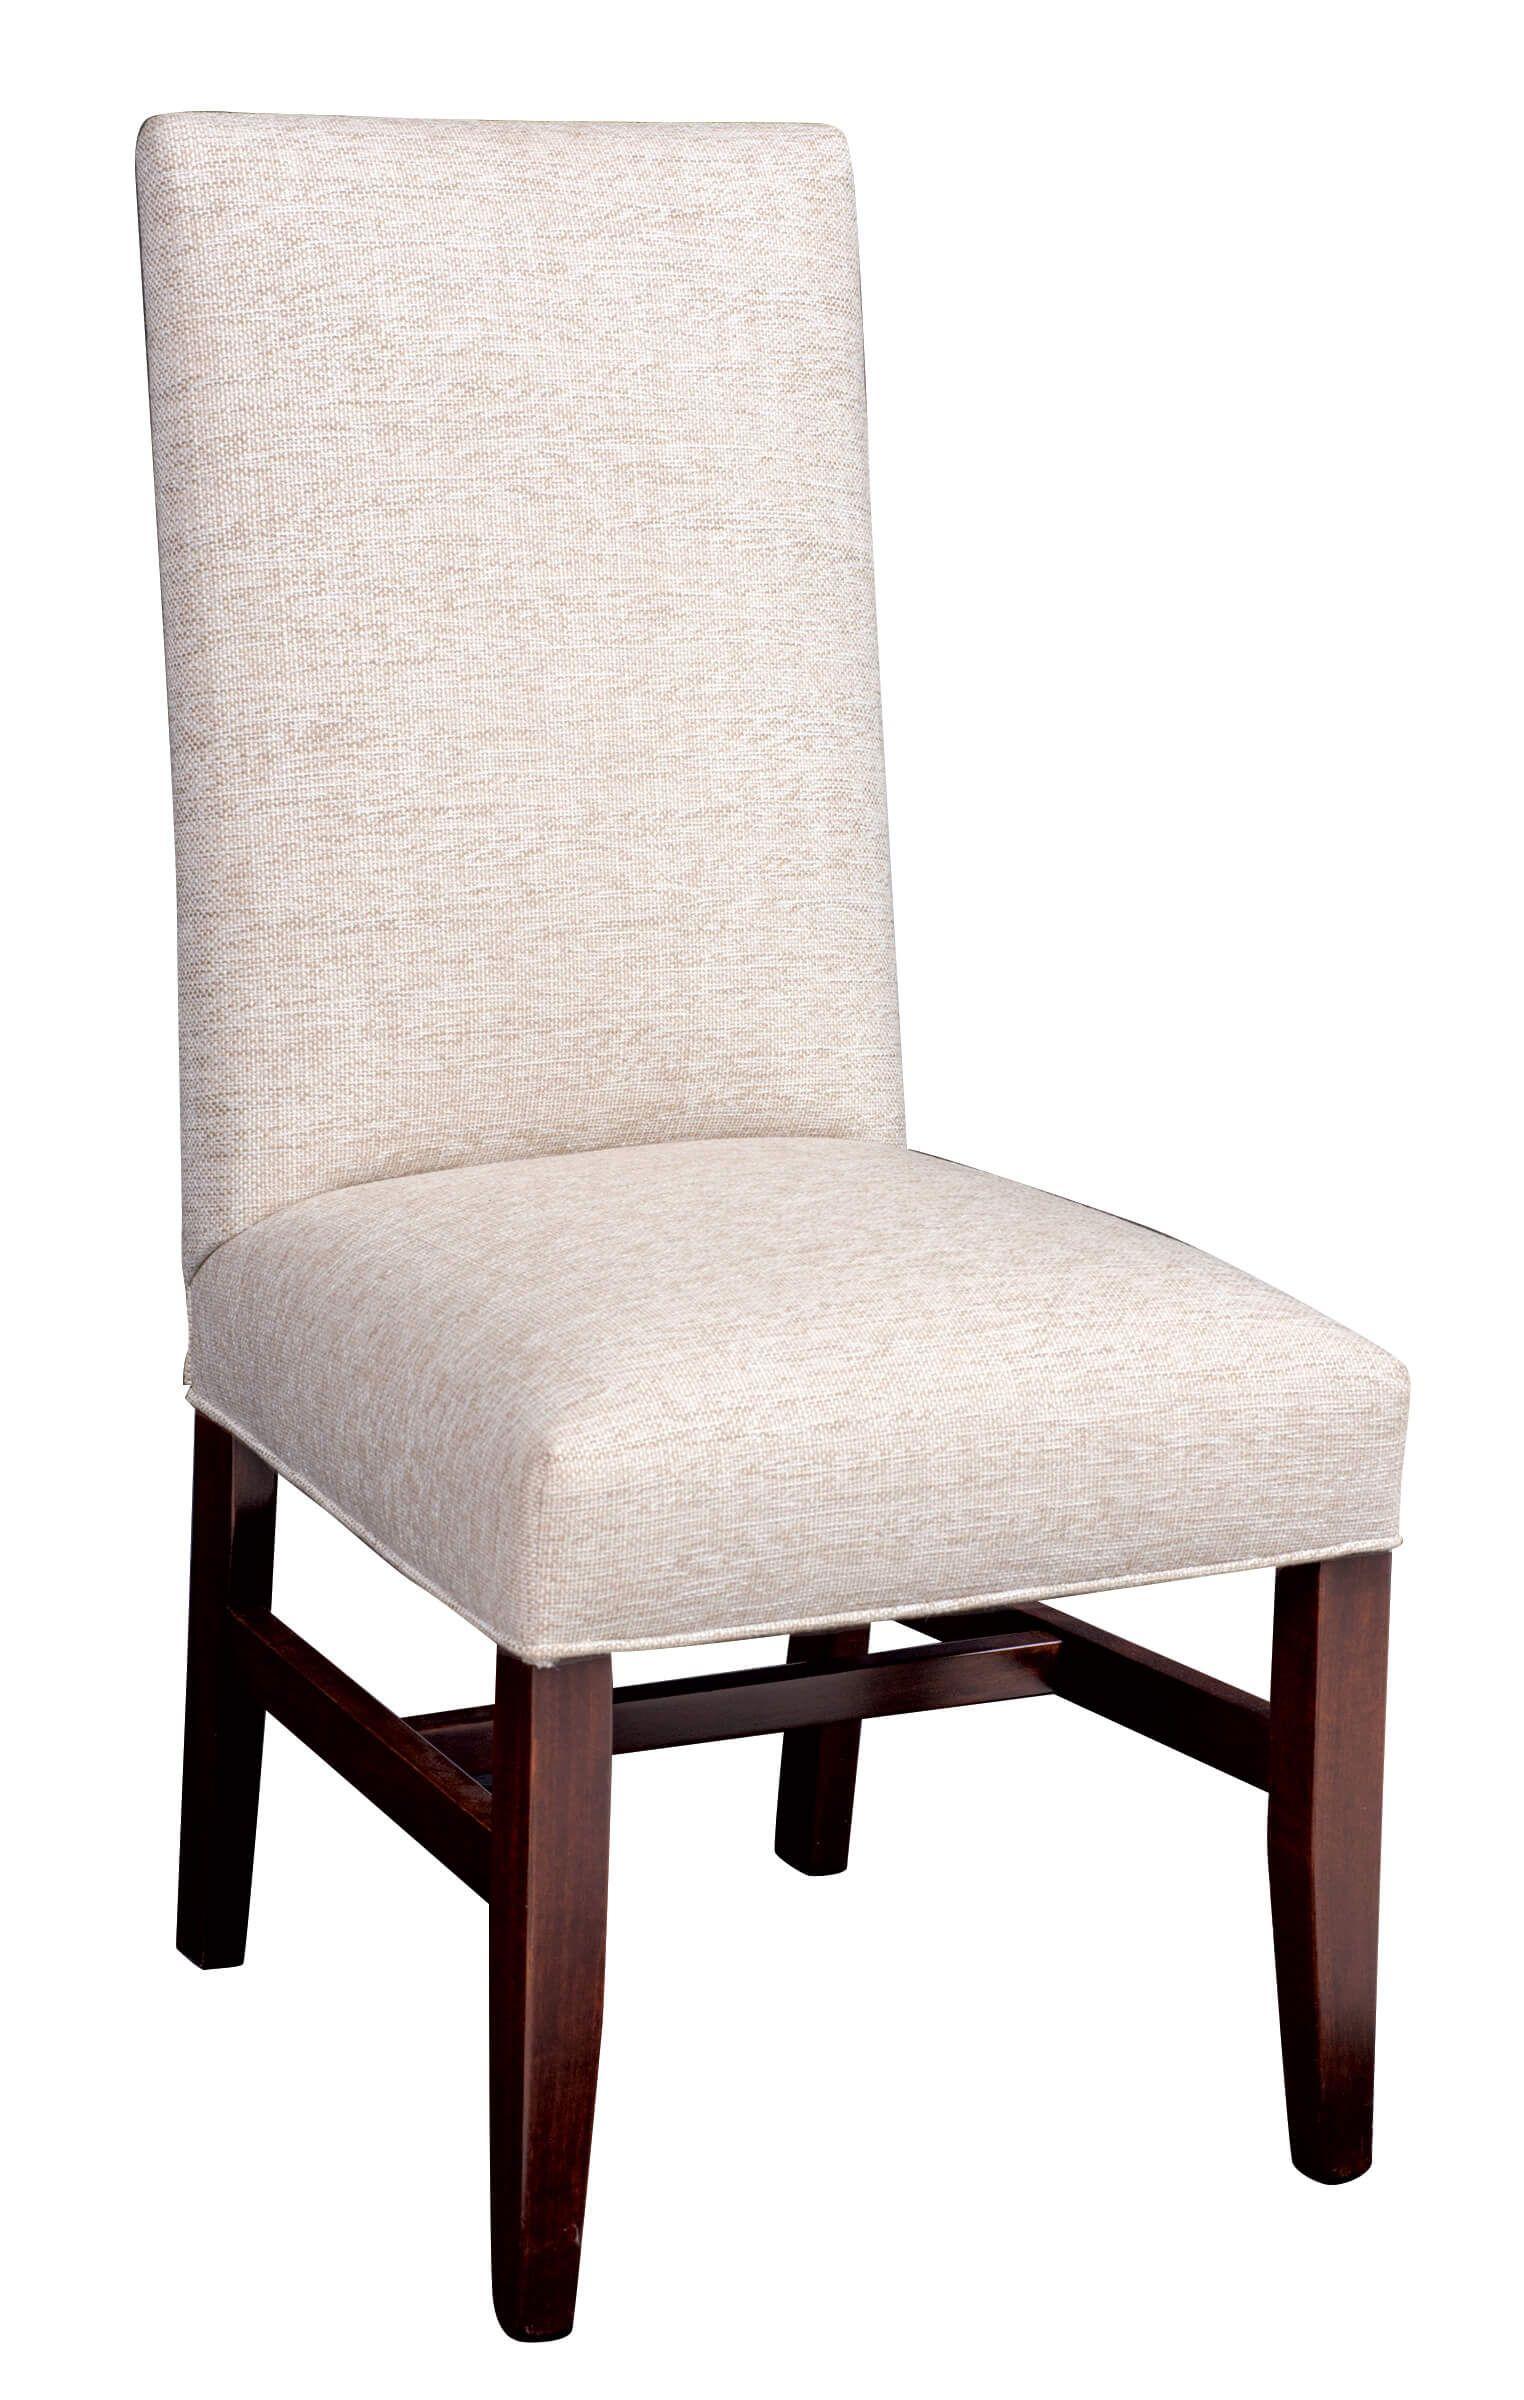 Alabaster Upholstered Side Chair